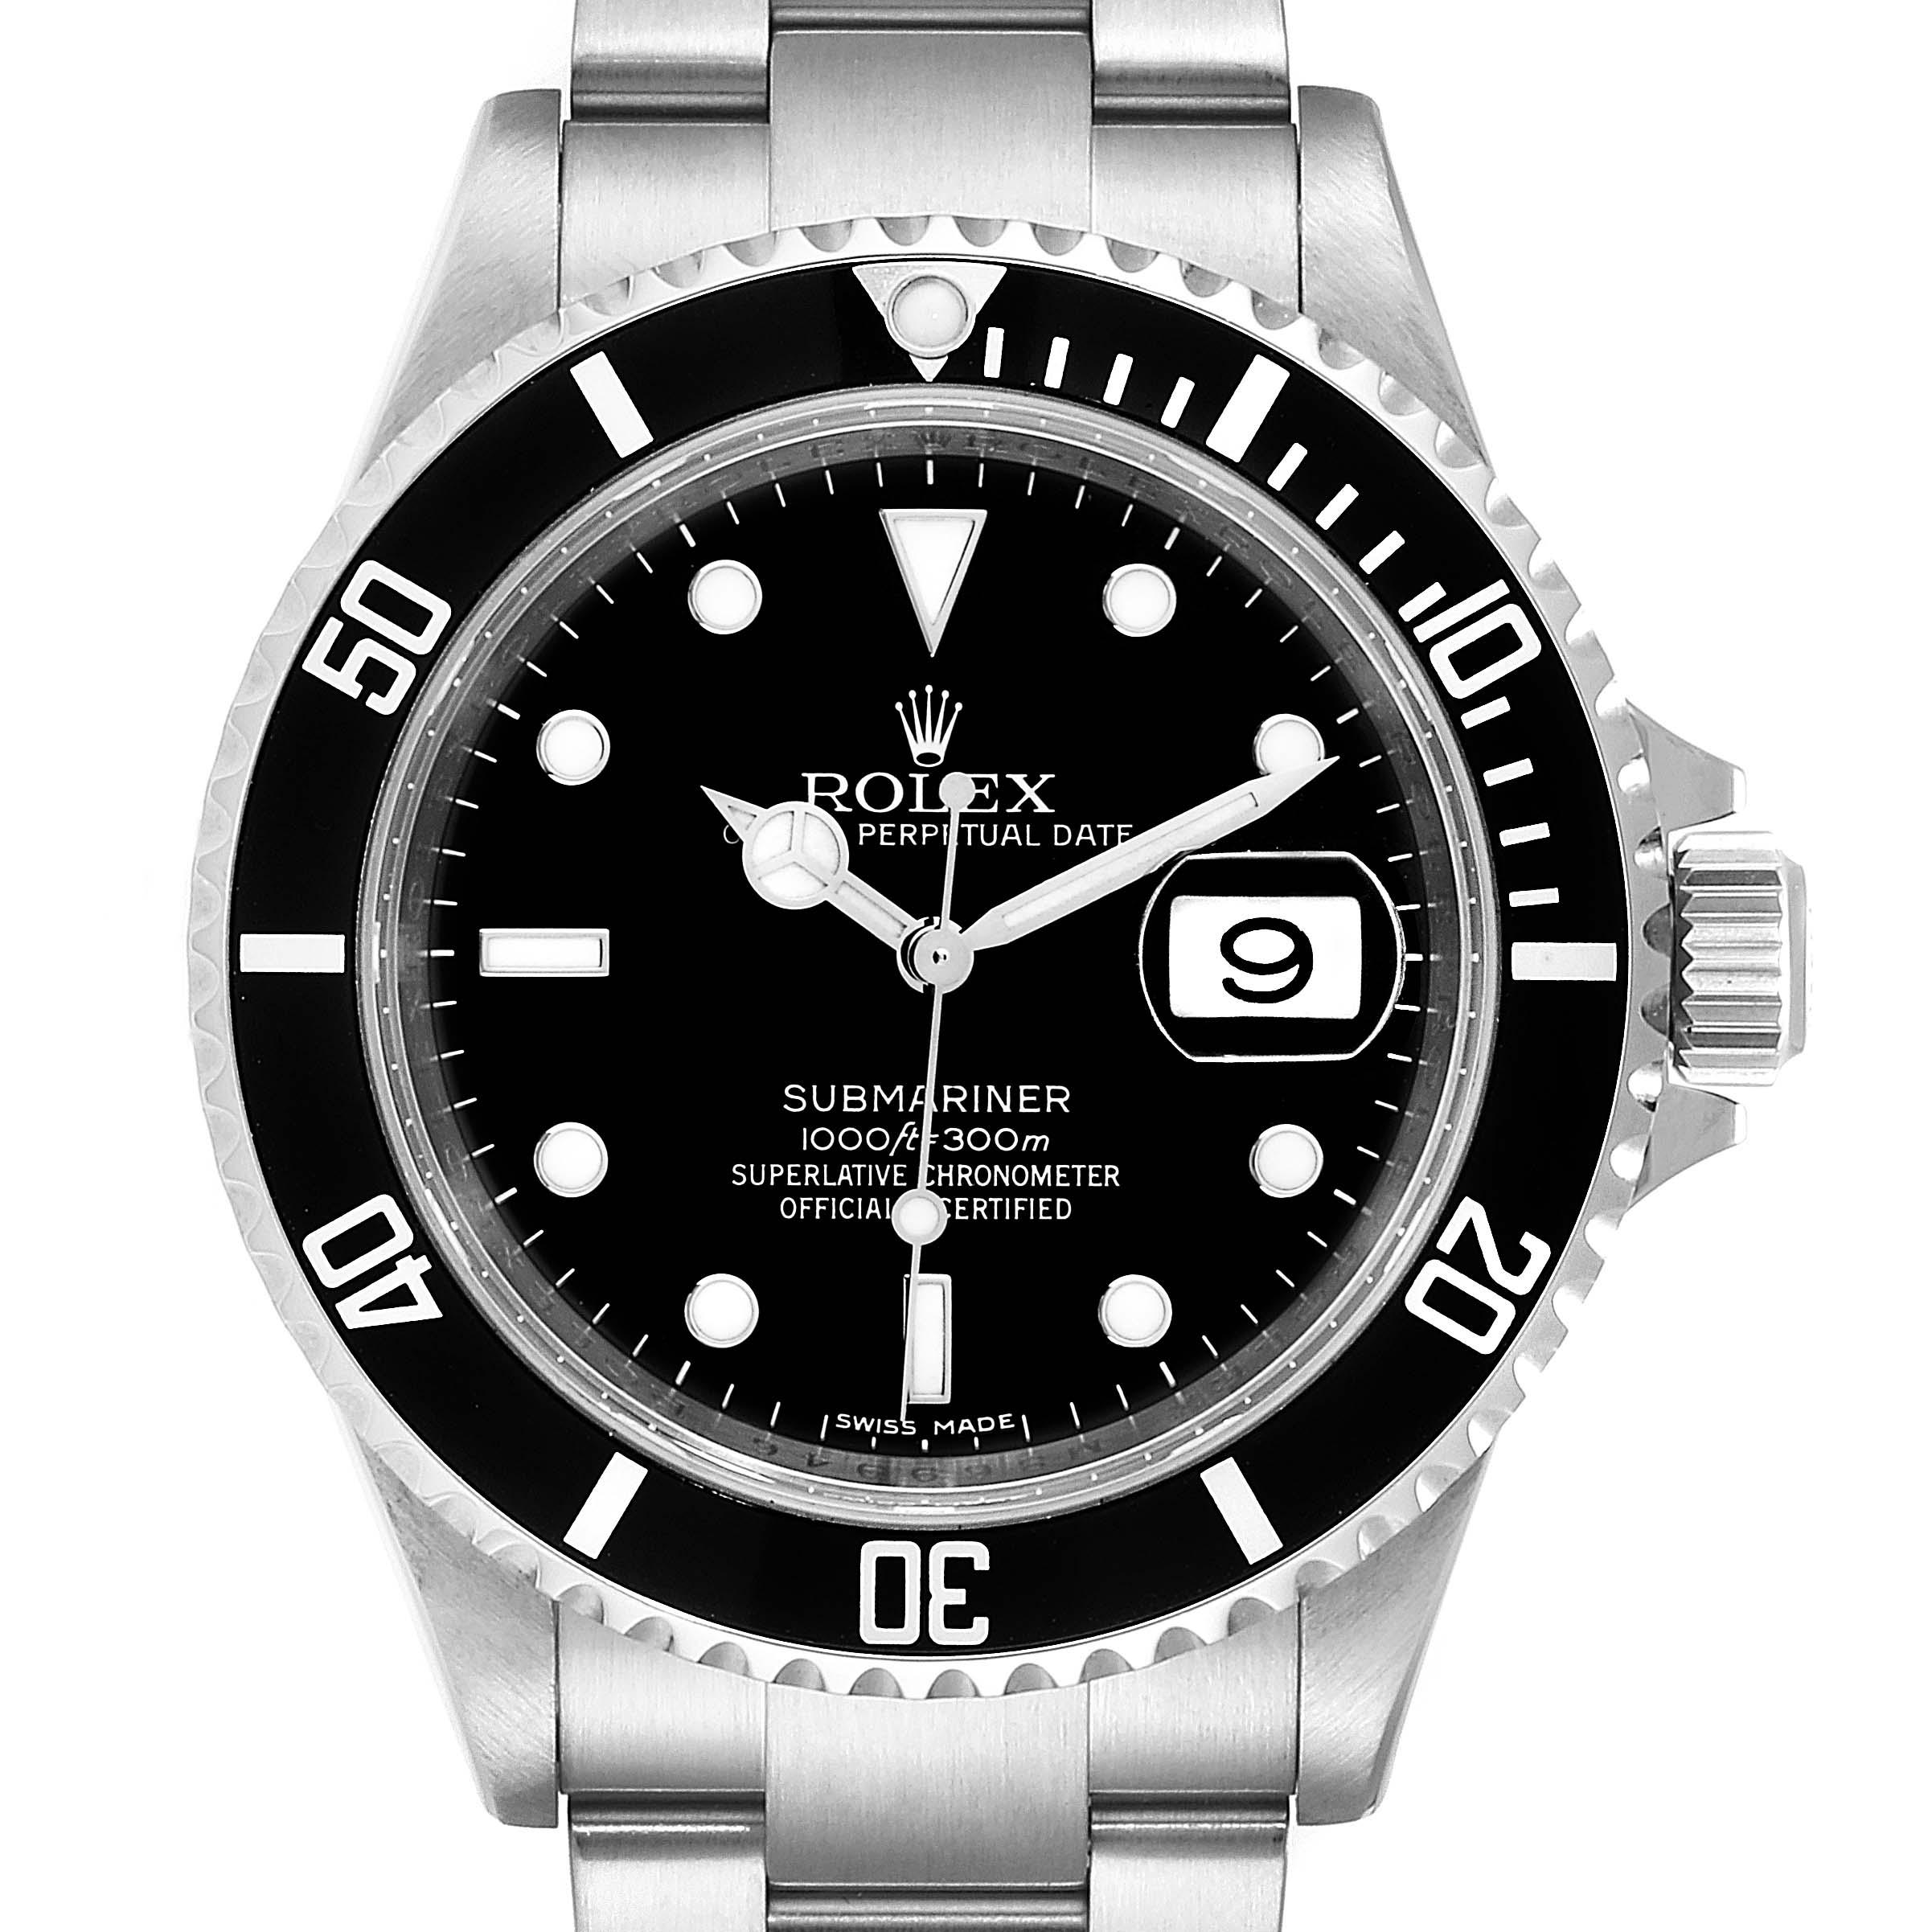 Rolex Submariner Date 40mm Stainless Steel Mens Watch 16610 Box Card